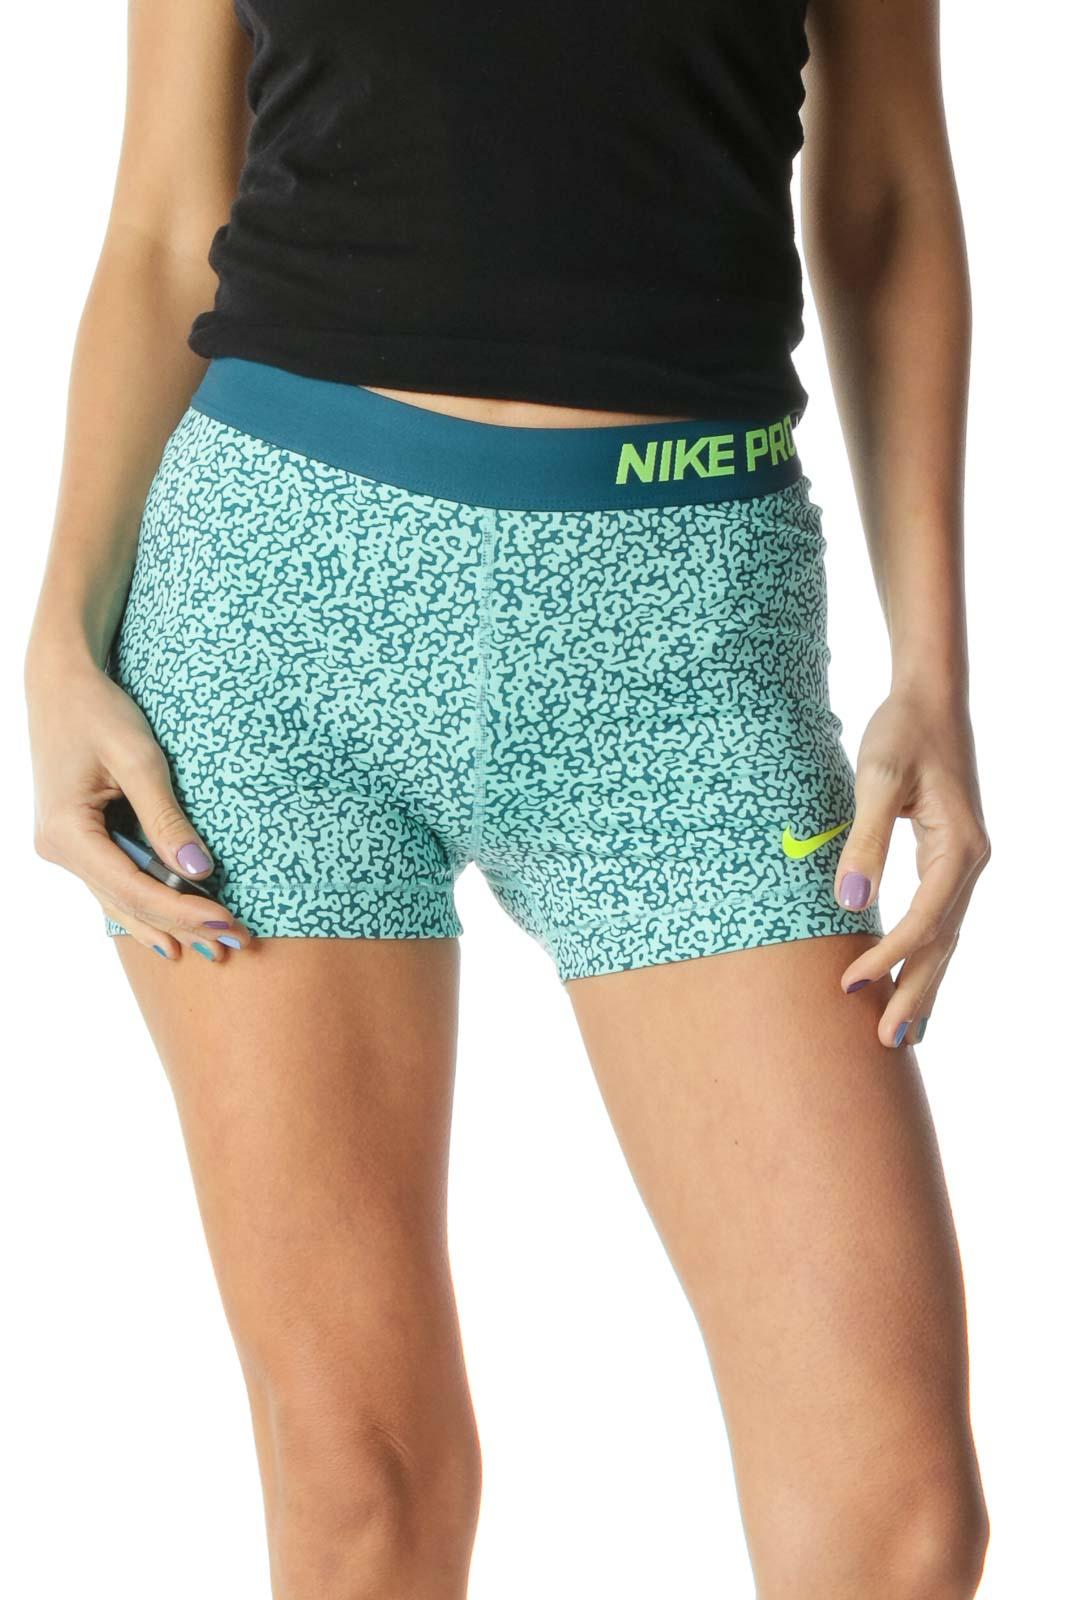 Green Navy Tight Sports Shorts Front